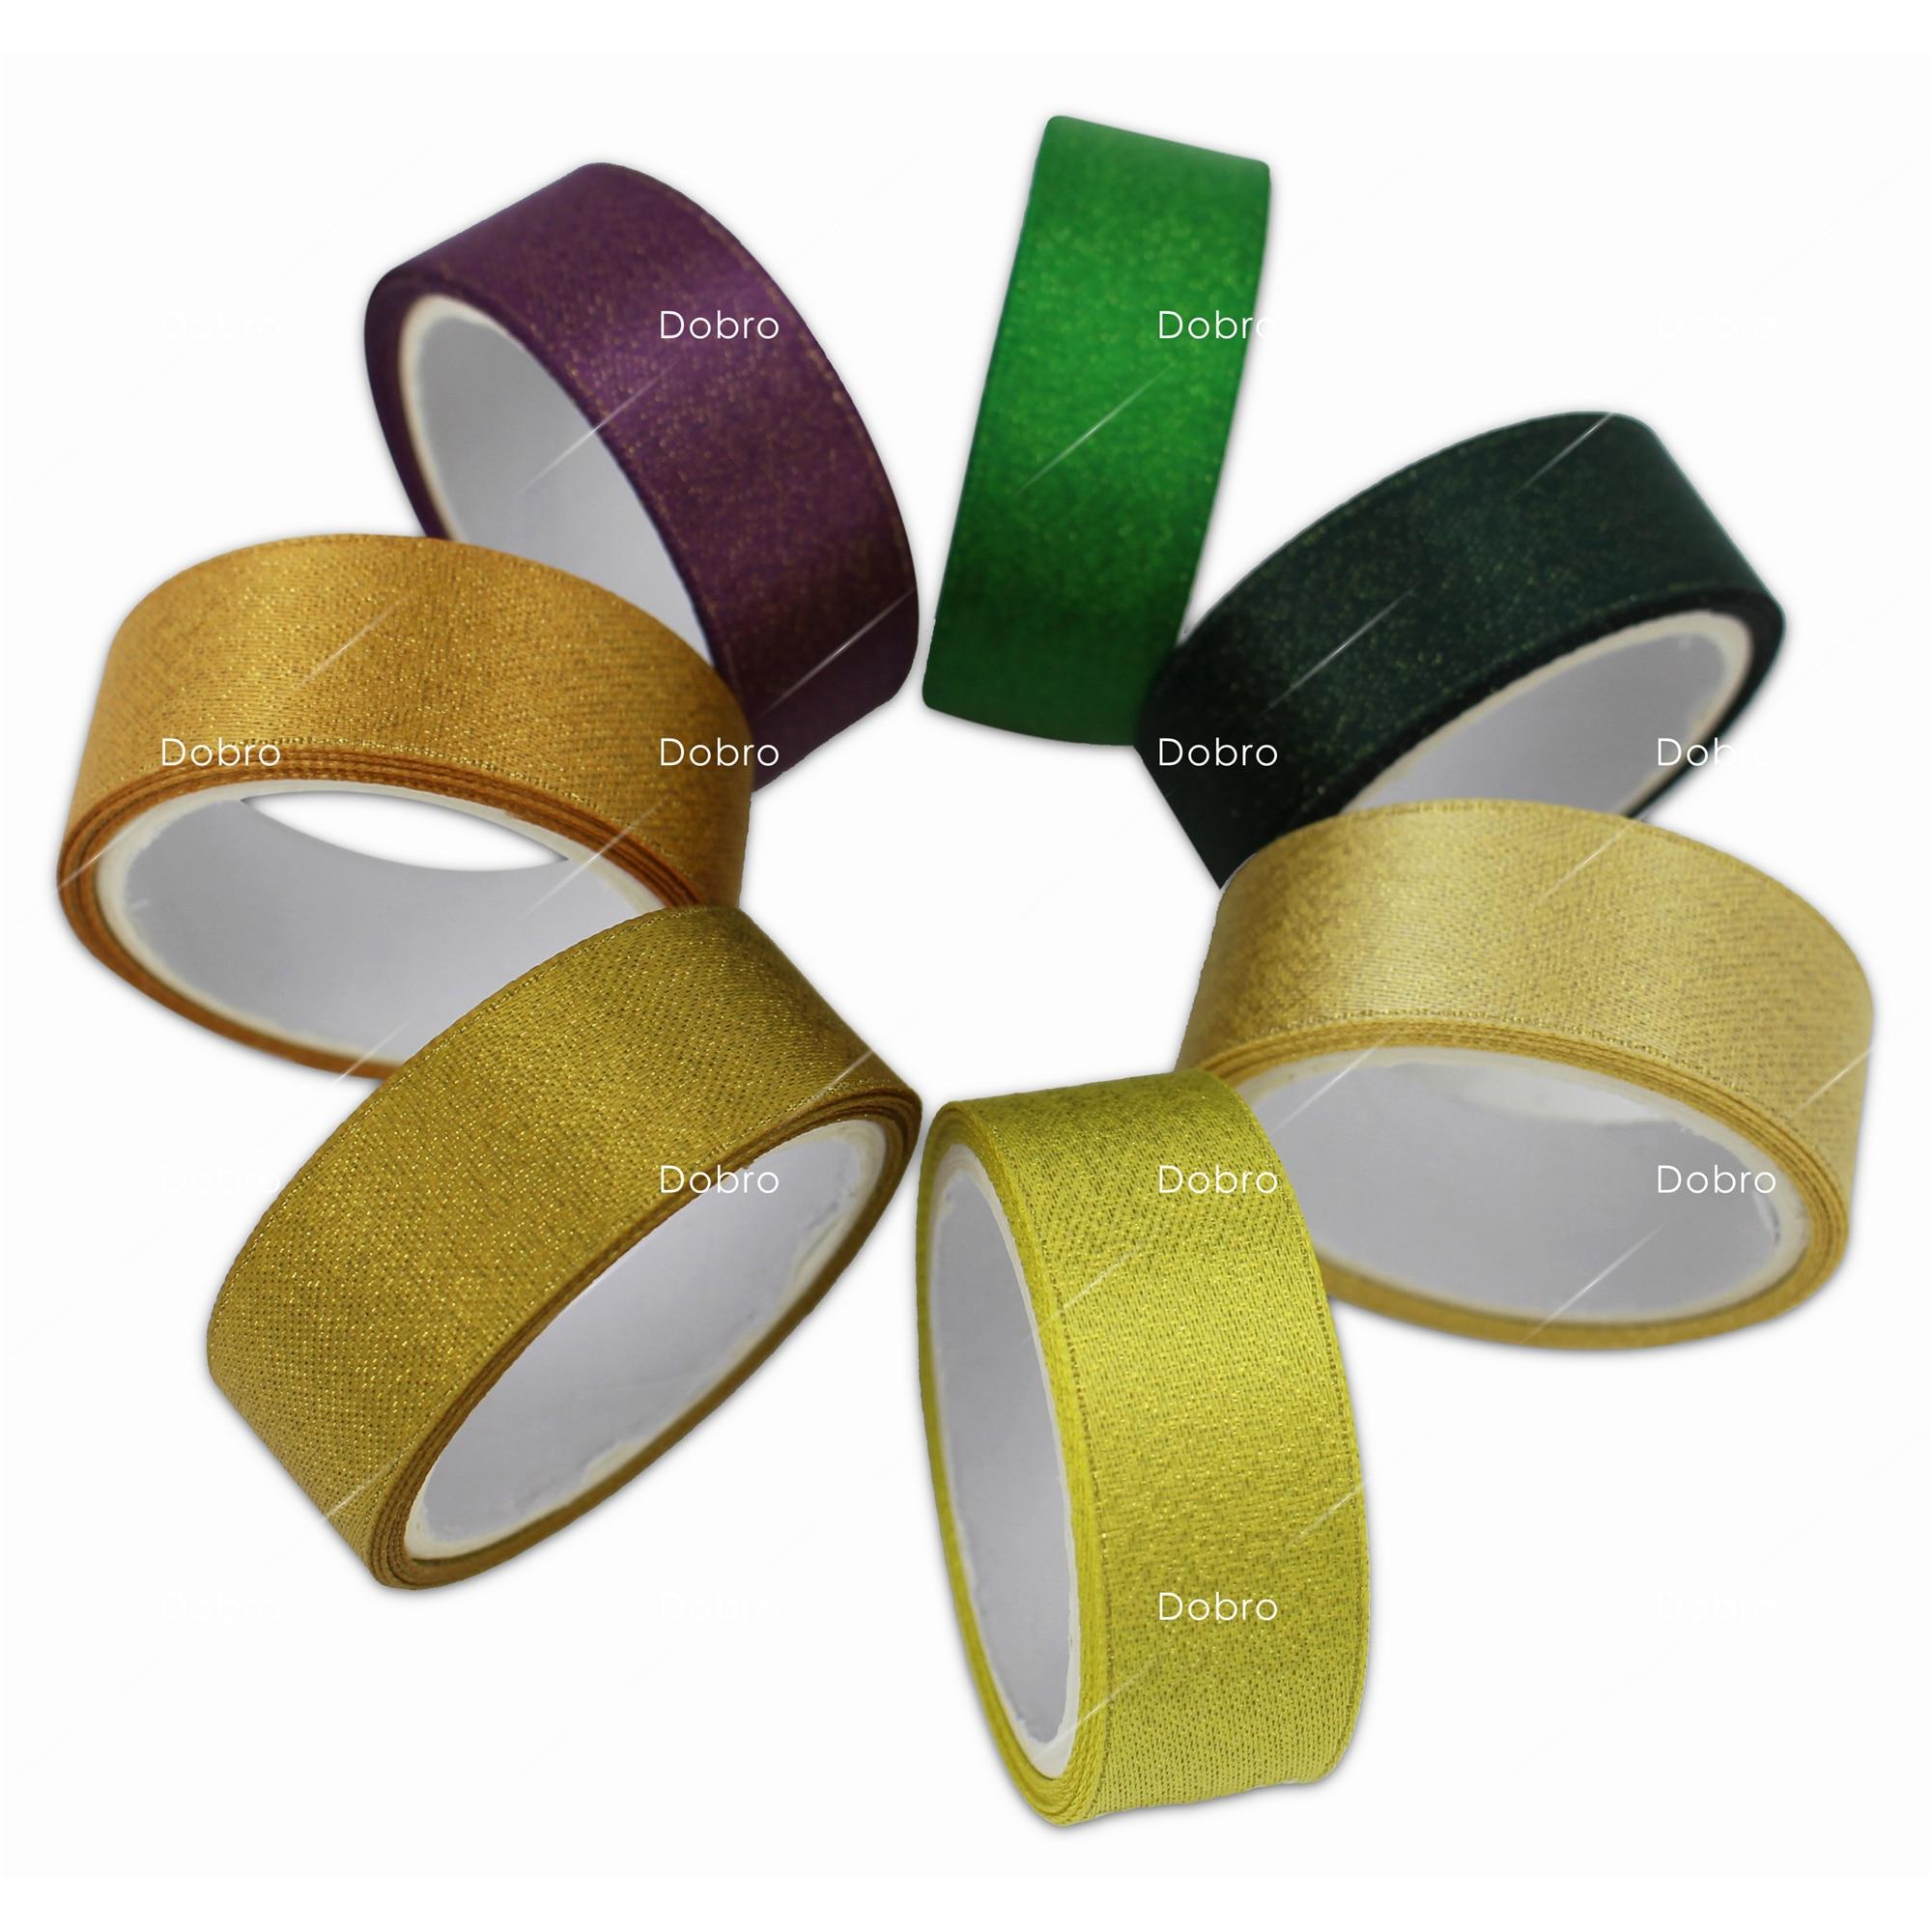 35 Colors Gold Purl Satin Ribbon 3 6 9 16 22 38mm - Өнер, қолөнер және тігін - фото 6